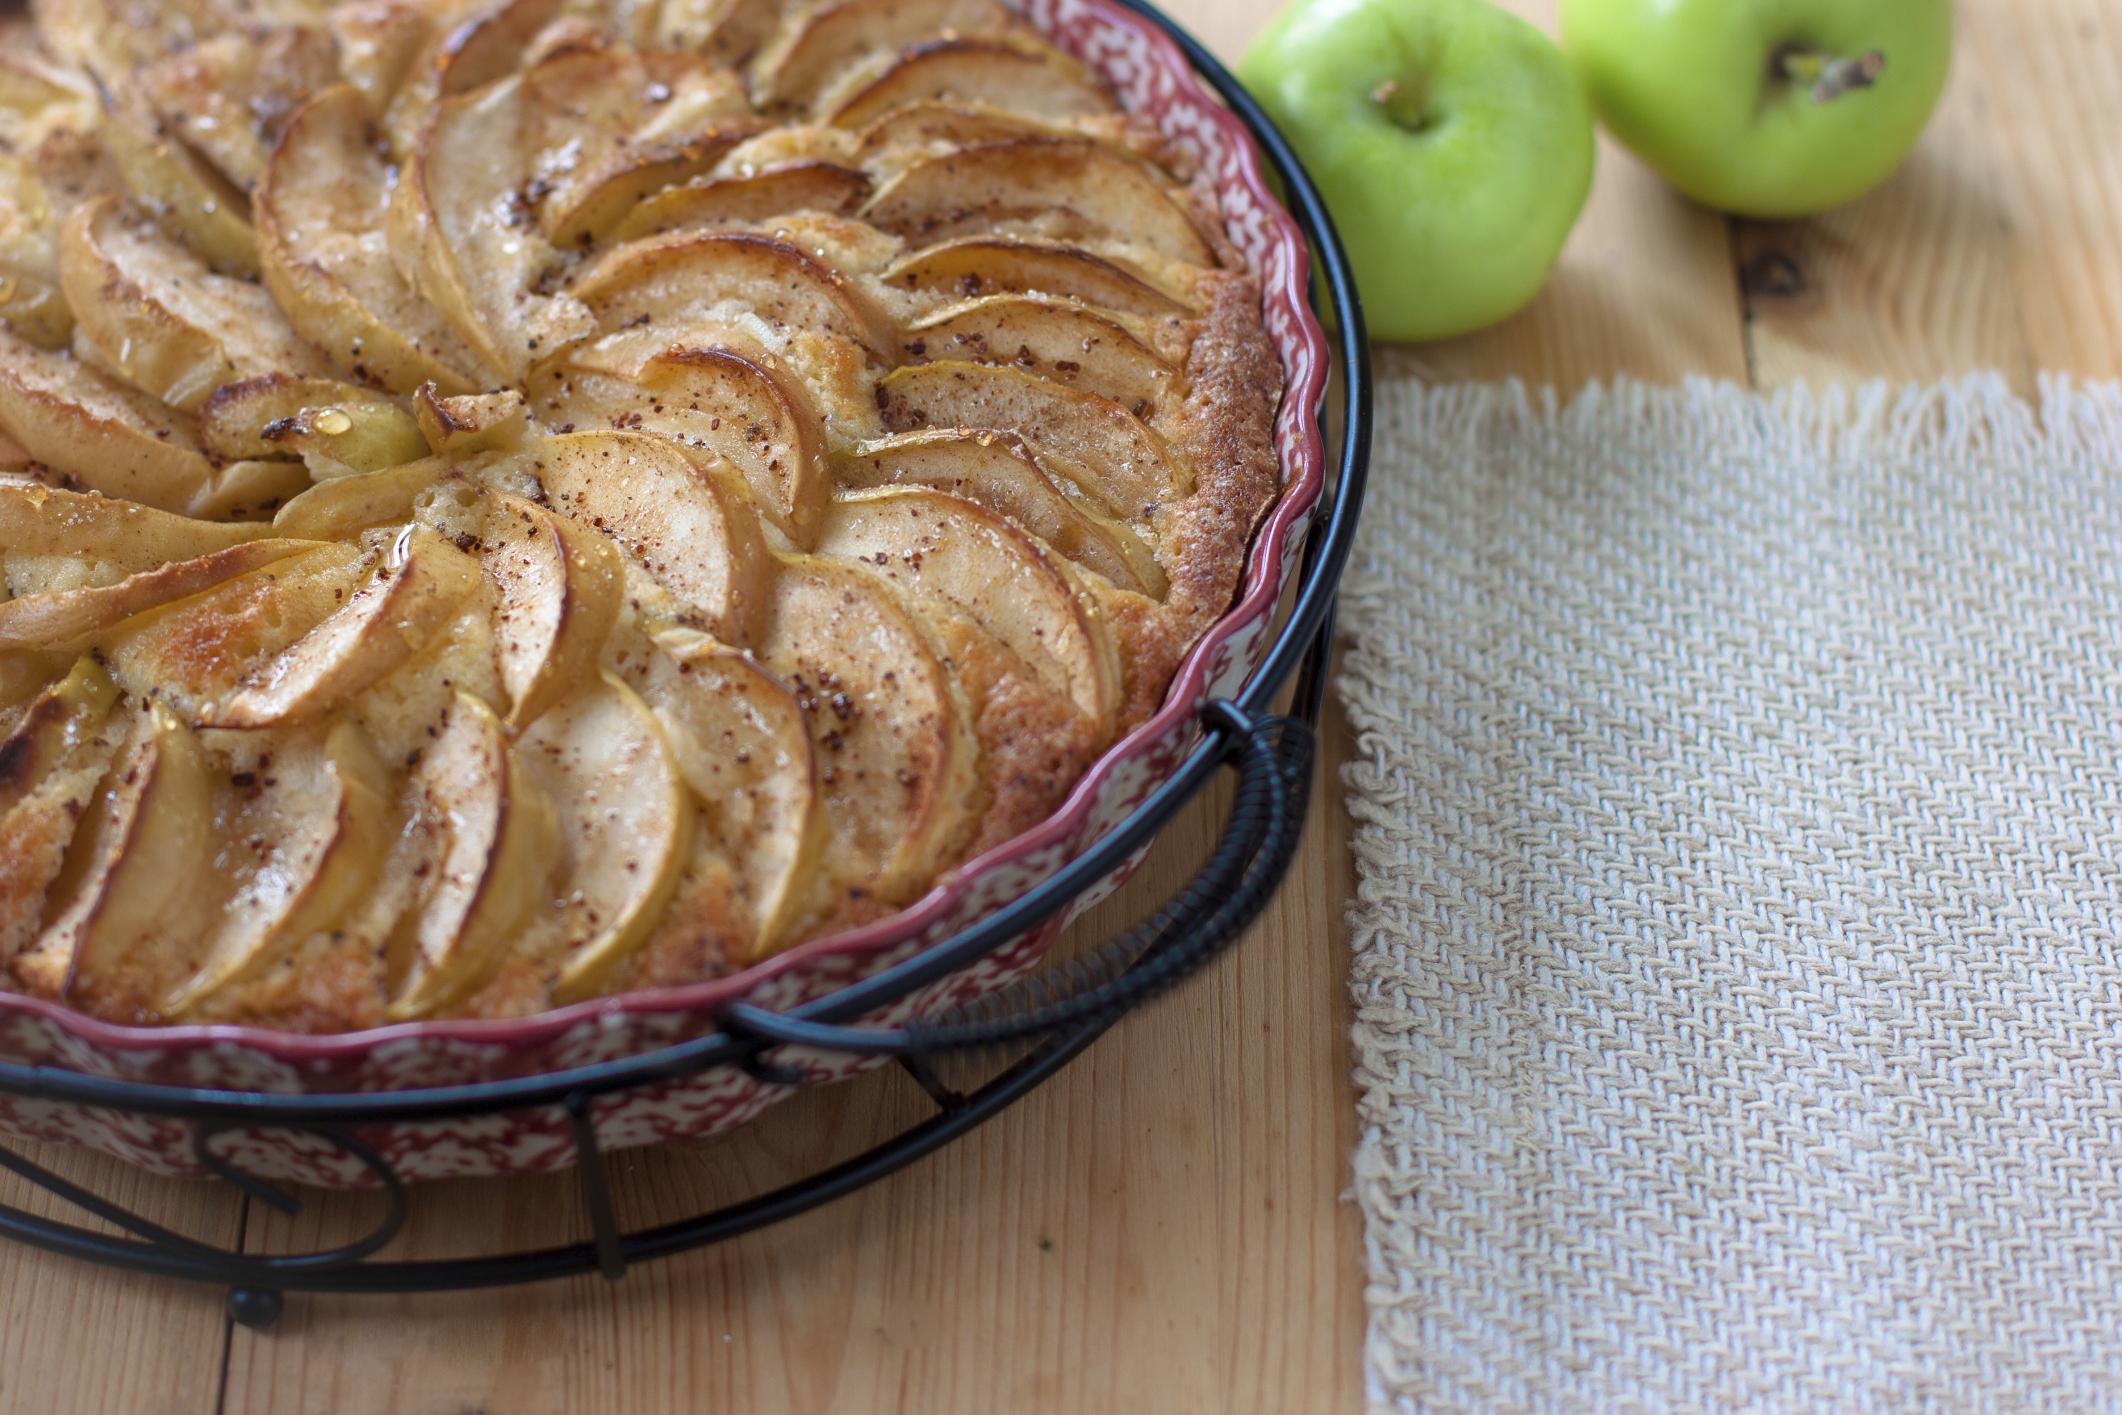 Tarta hojaldrada de manzanas